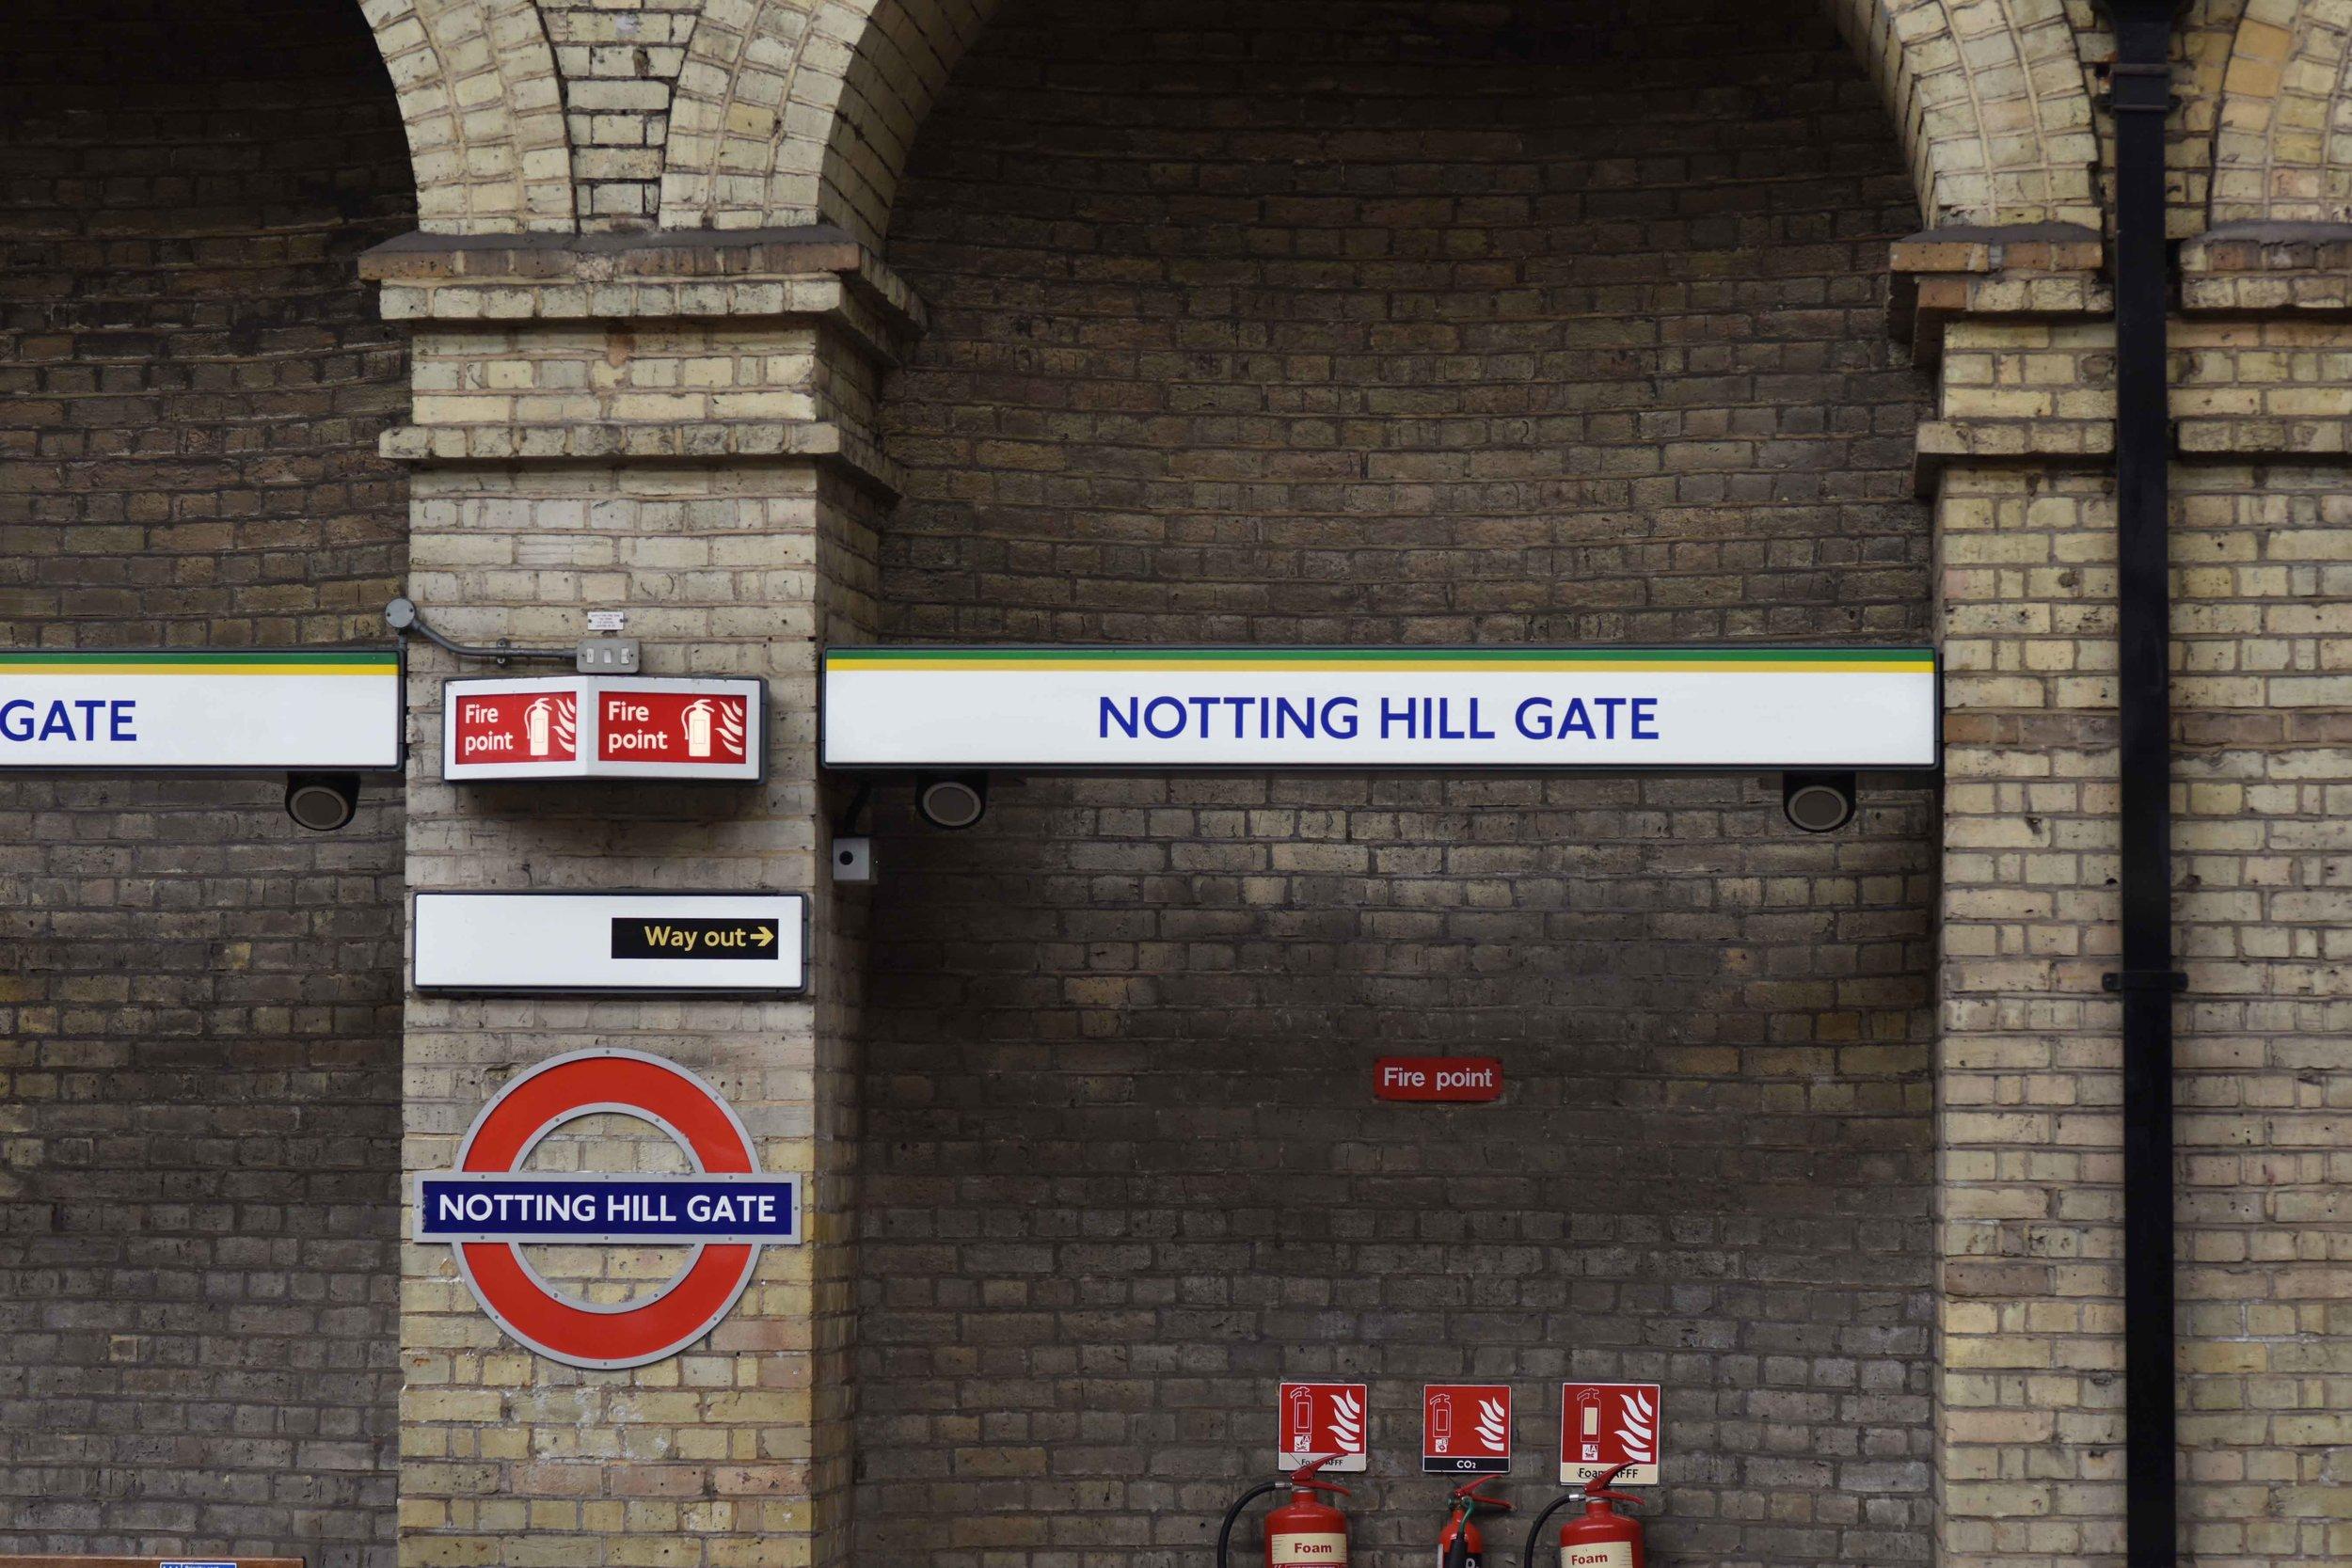 Notting Hill Underground Station. Image©thingstodot.com